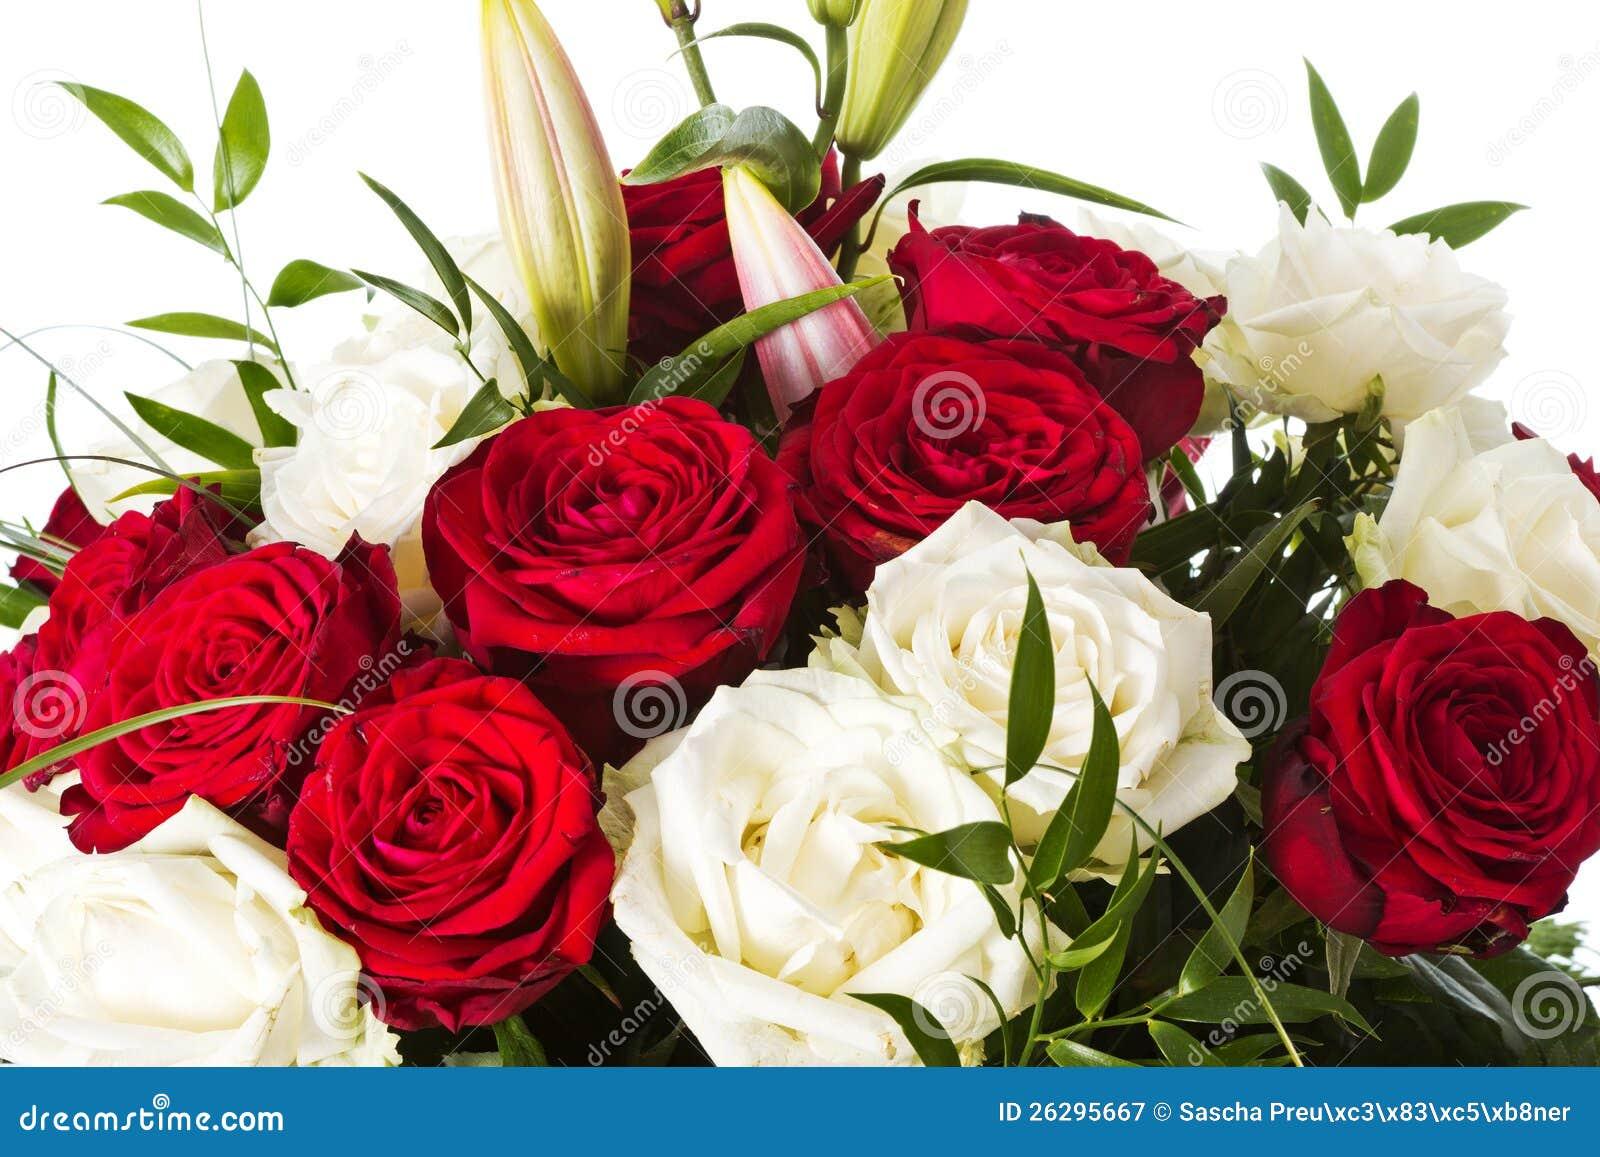 Bunch Of Roses Stock Image. Image Of Celebration, Petal